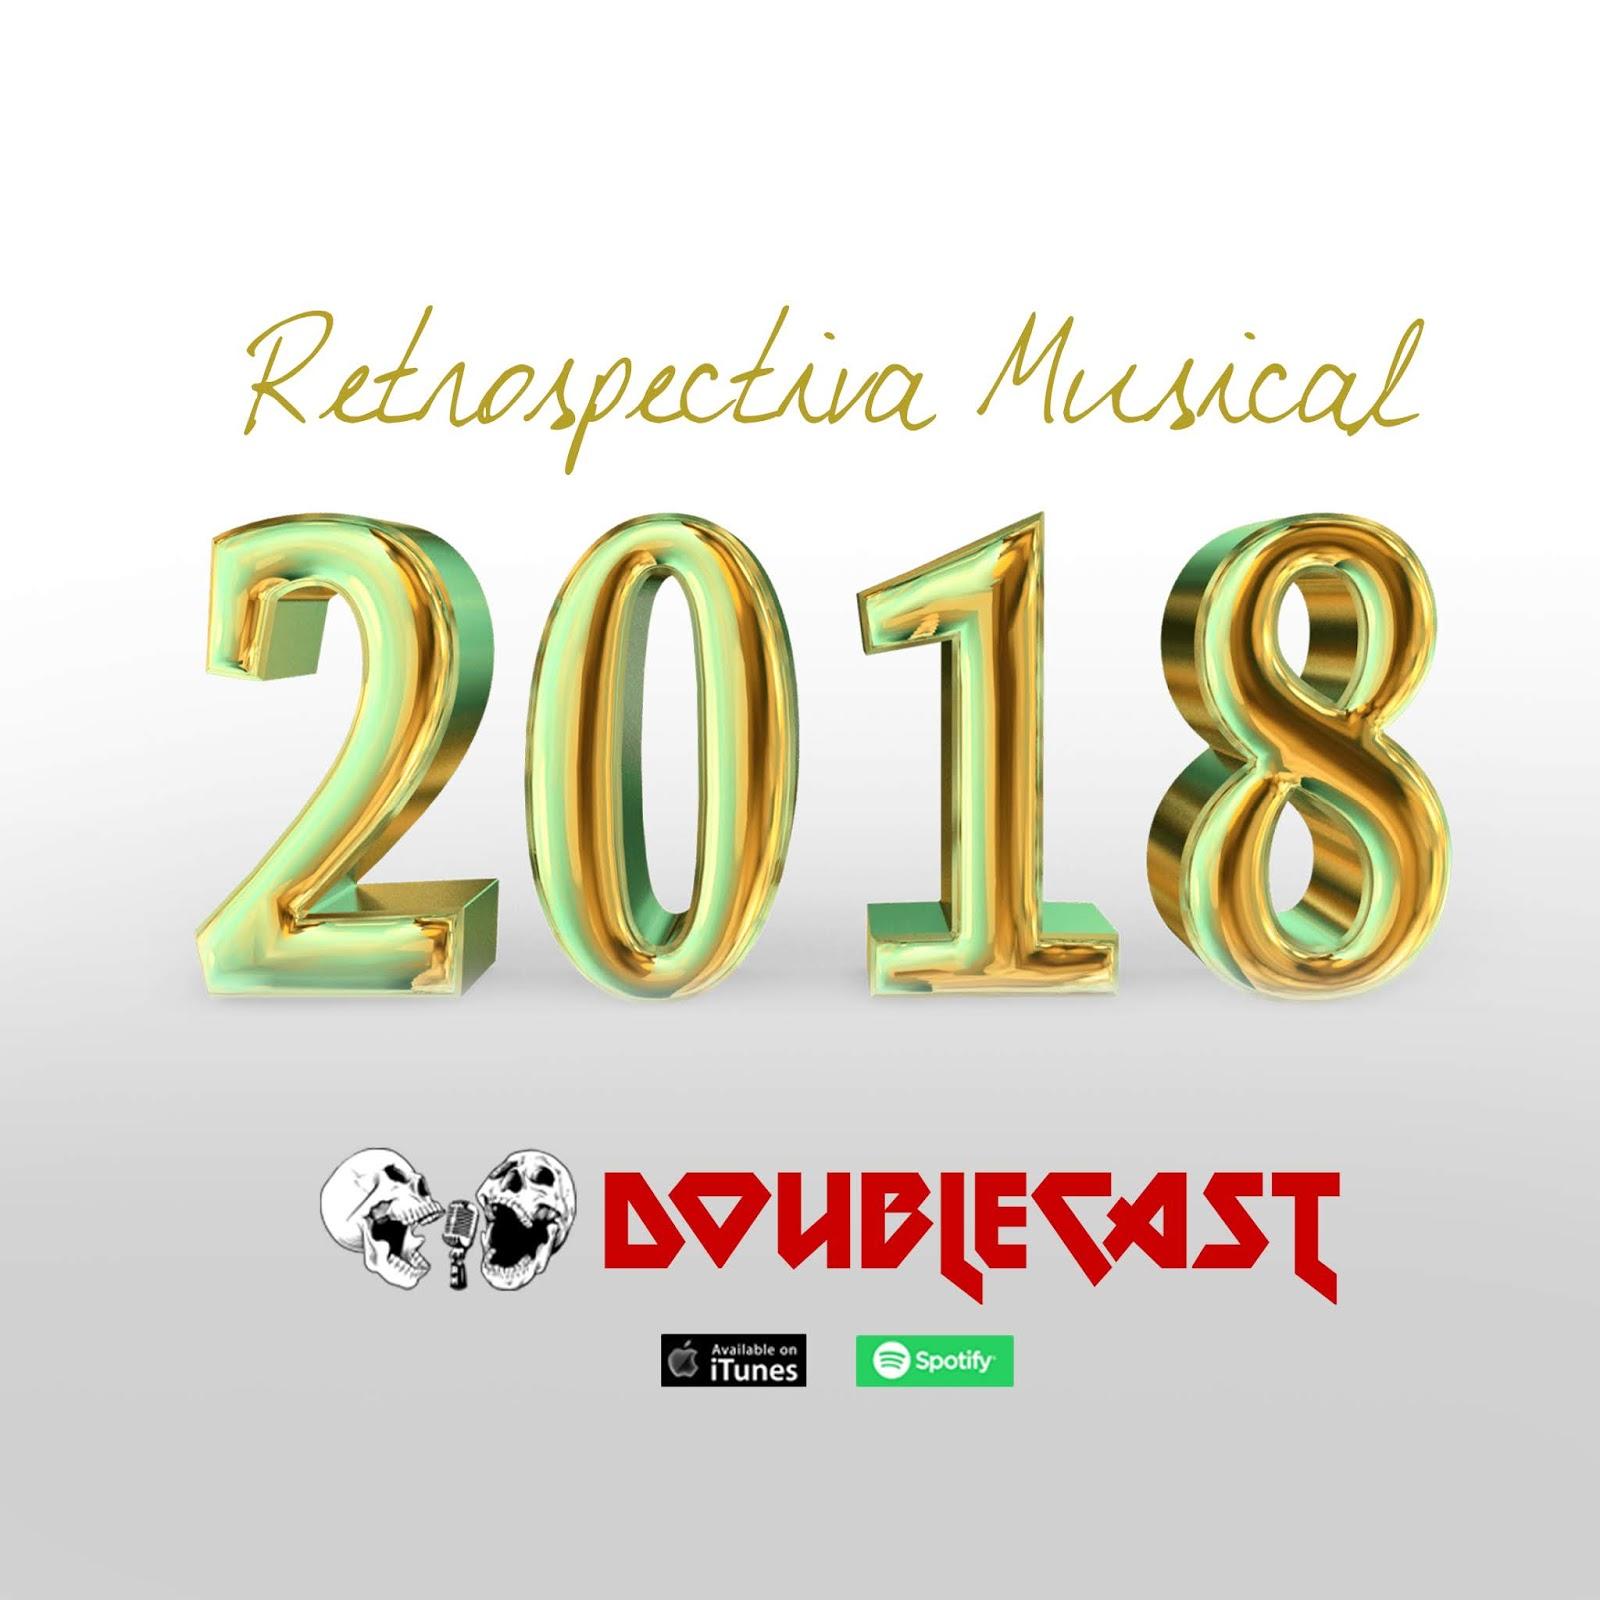 Doublecast 66 - Retrospectiva Musical 2018